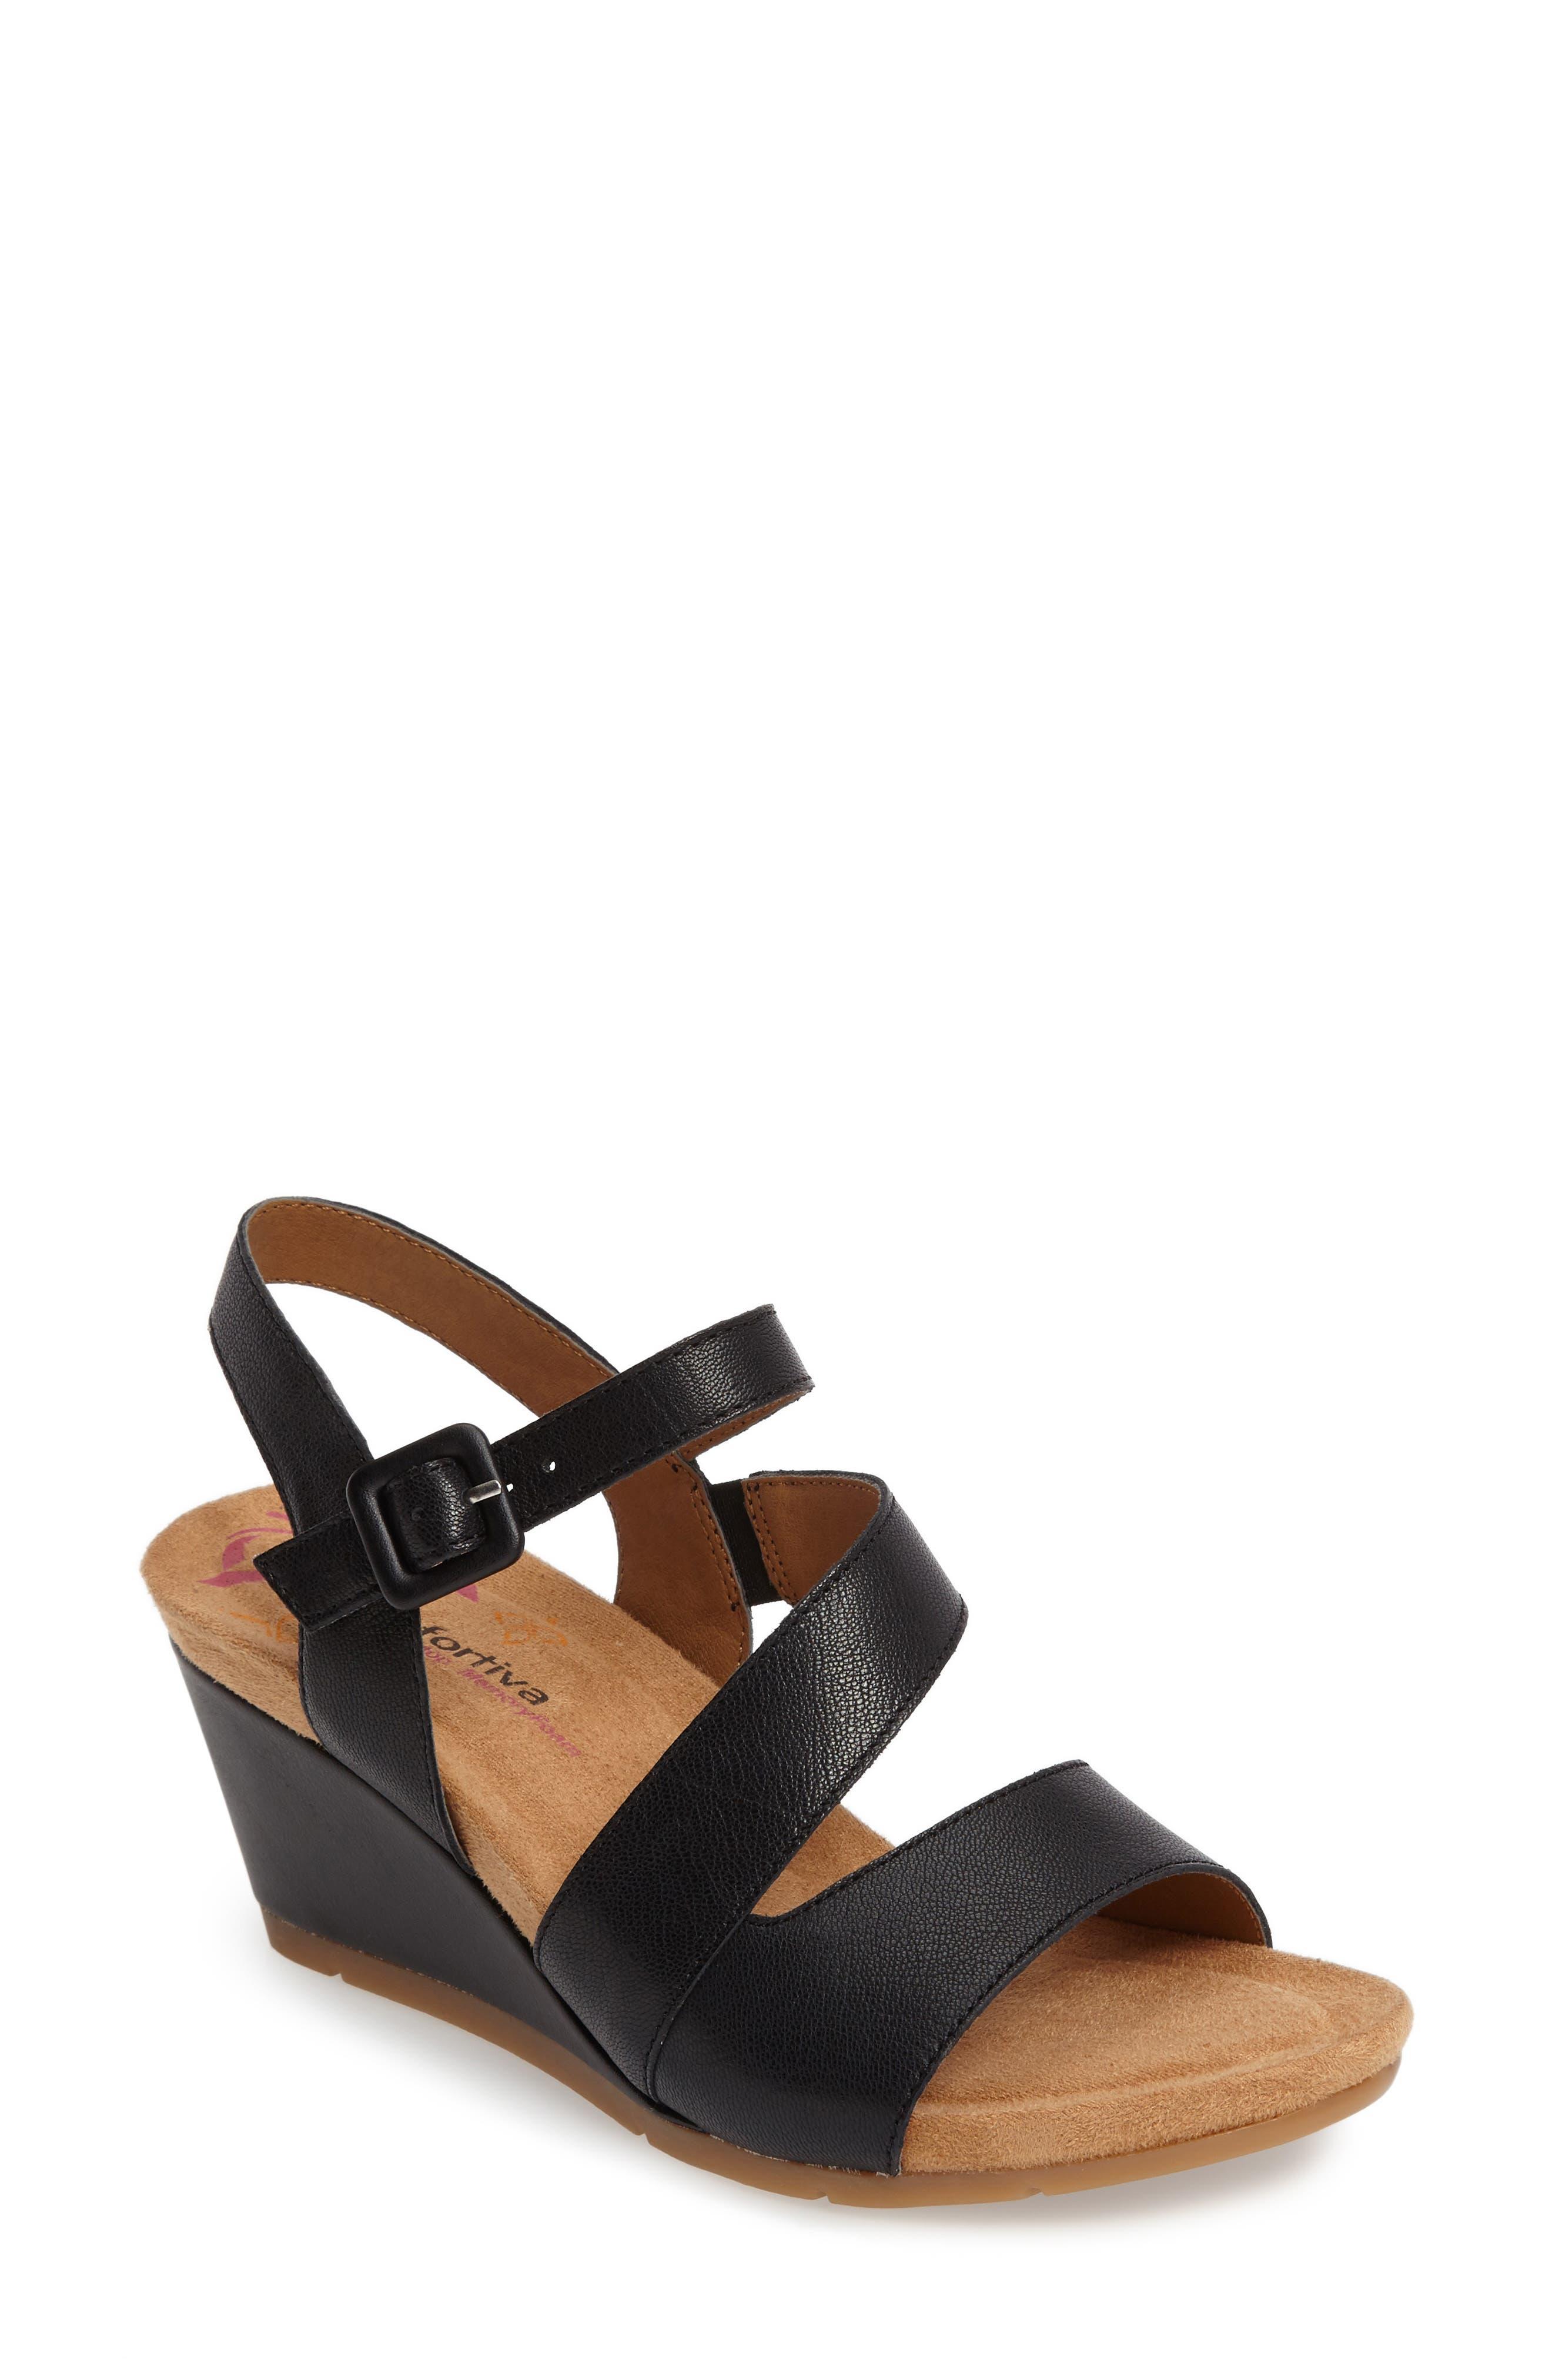 Main Image - Comfortiva Violet Wedge Sandal (Women)